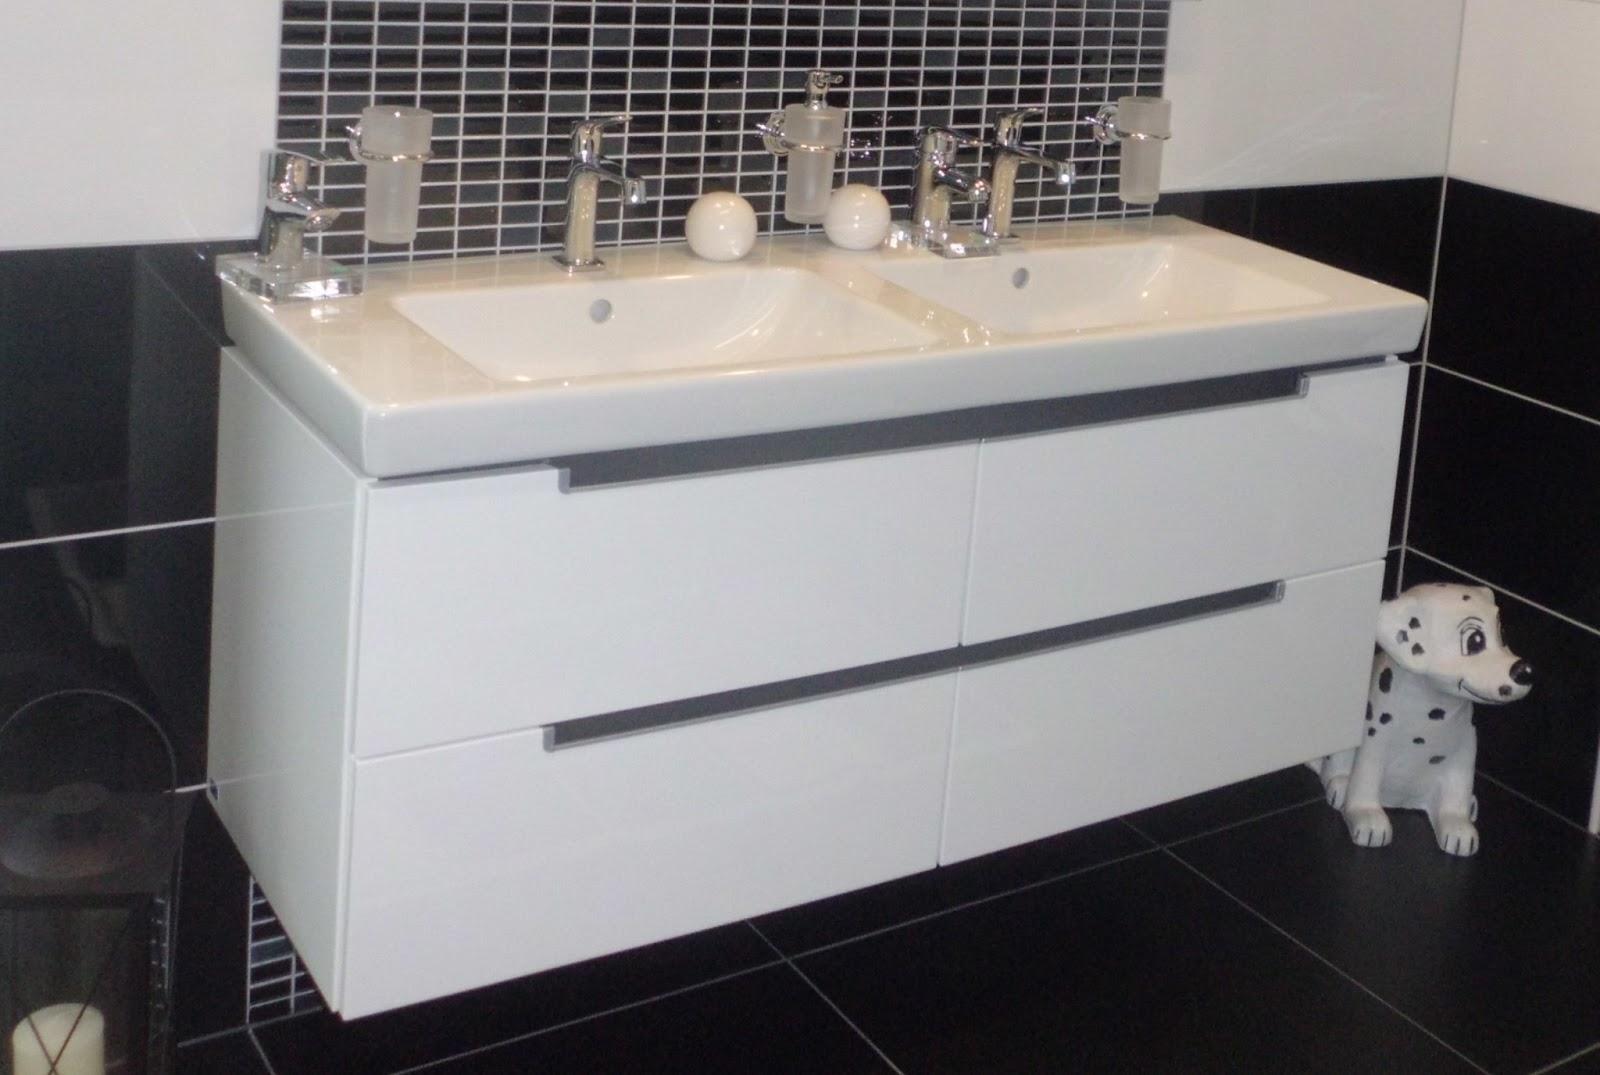 Steckdosen Badezimmer Waschbecken, Badezimmer Ideen